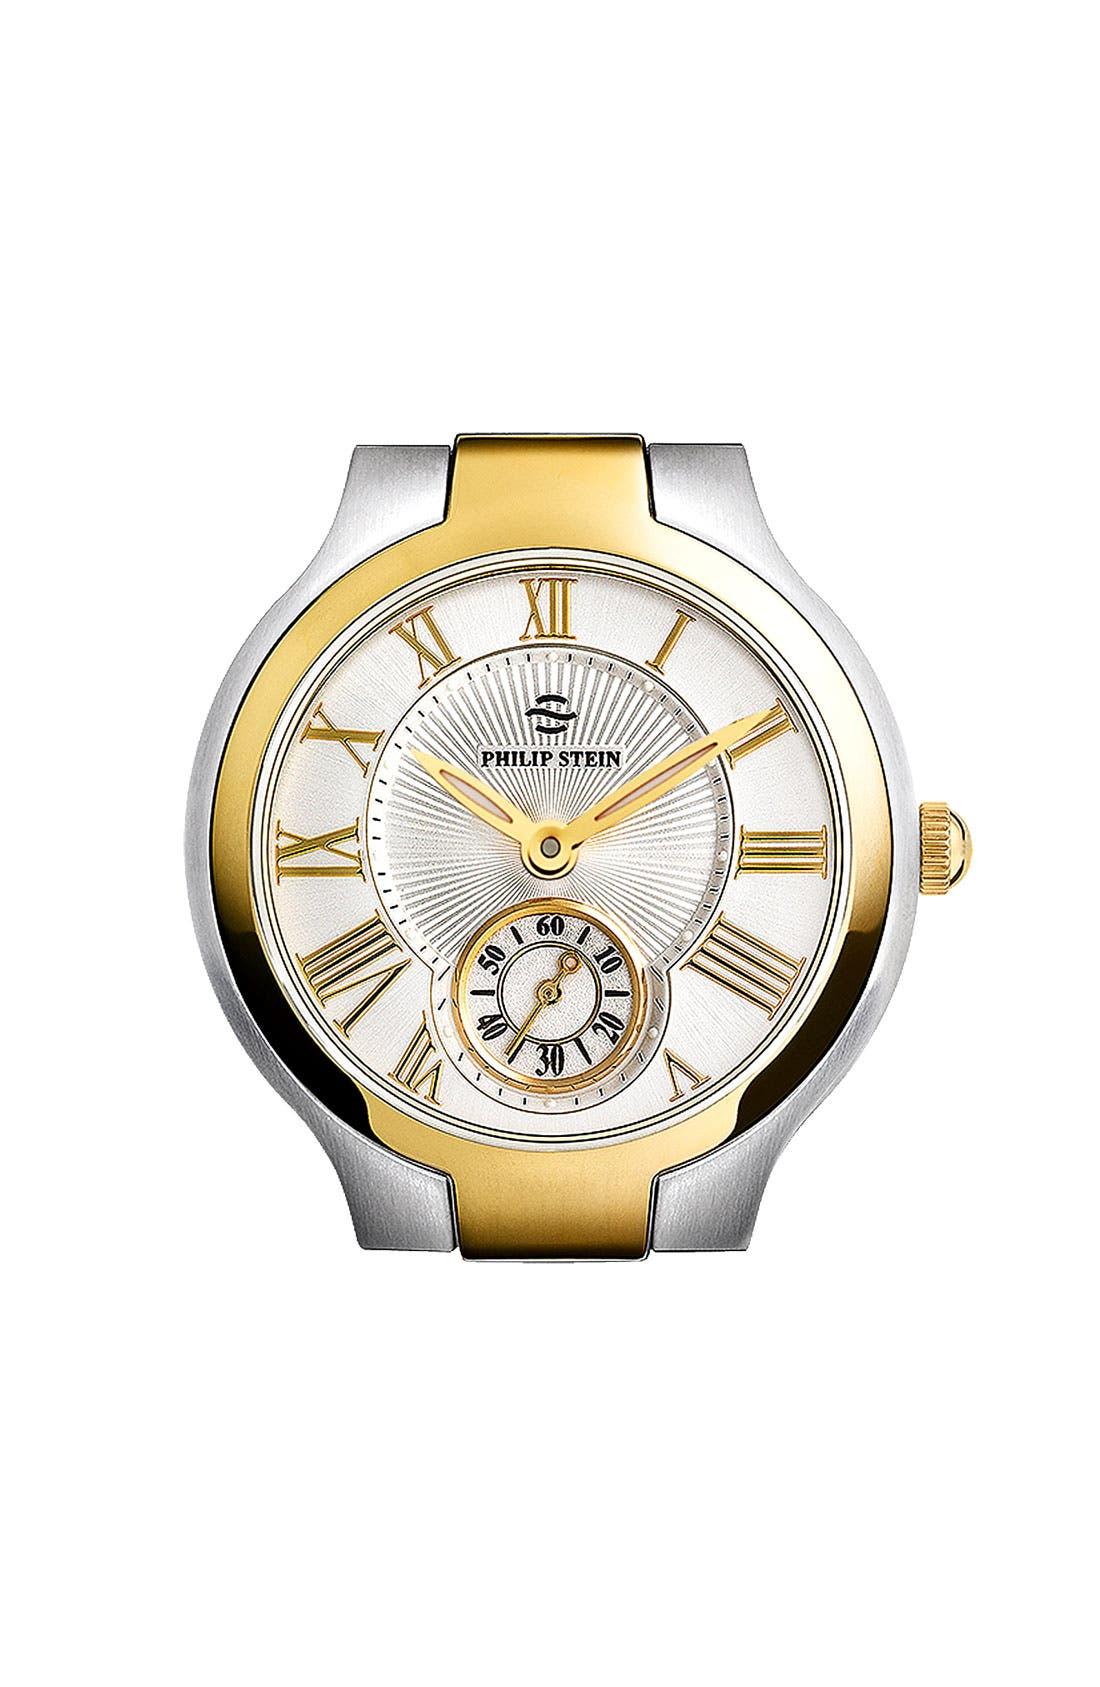 Alternate Image 1 Selected - Philip Stein® Round Watch Case